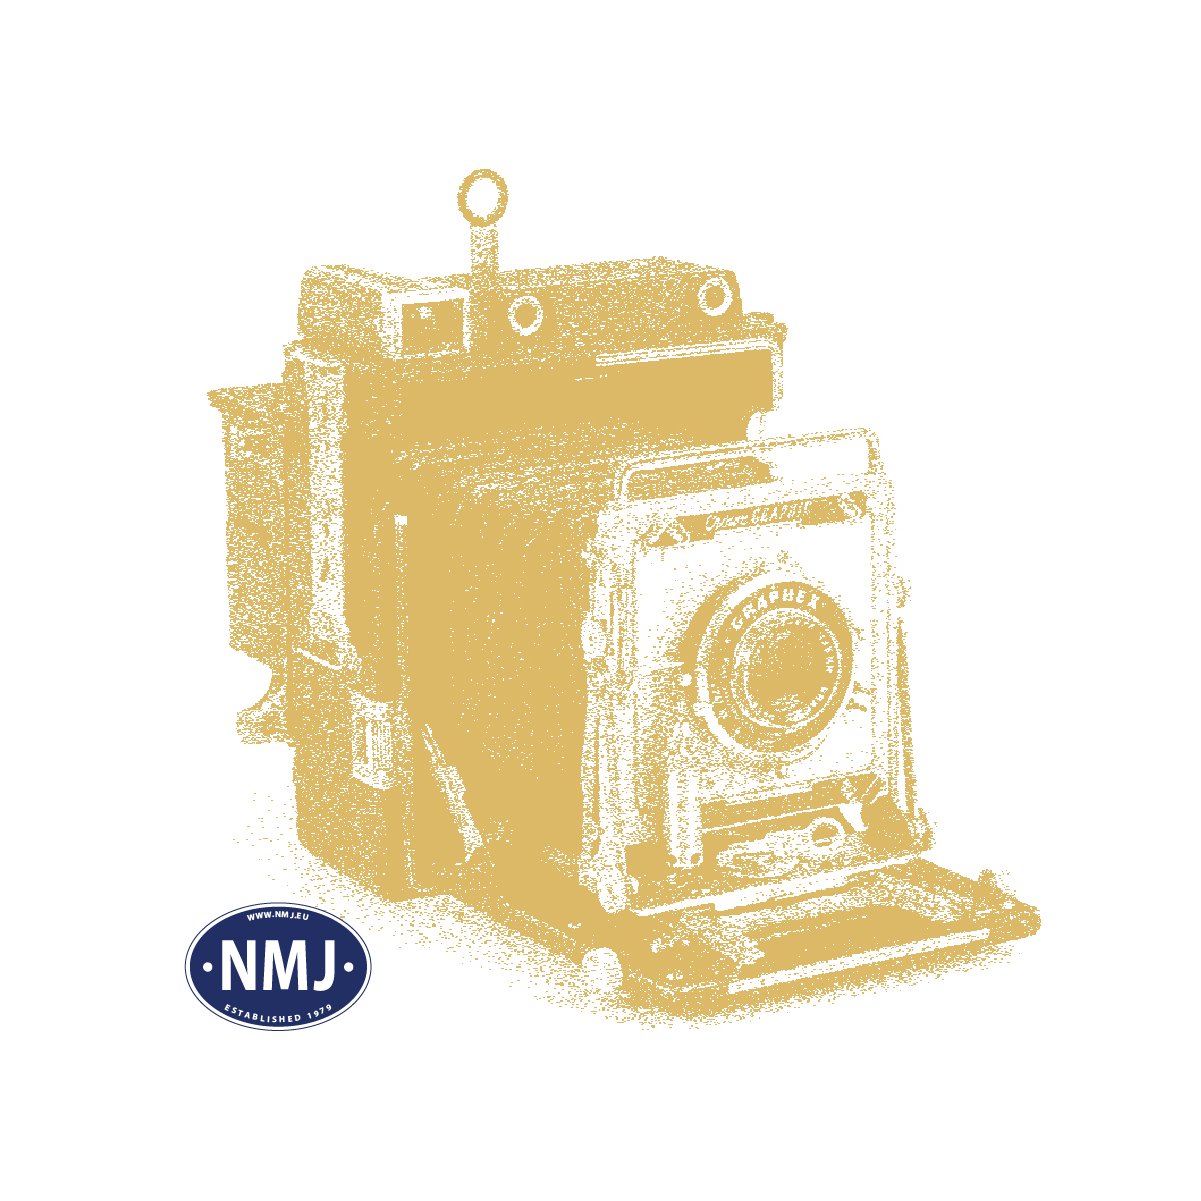 NMJT86.401 - NMJ Topline NSB El11b.2102, rot/schwarz, DC